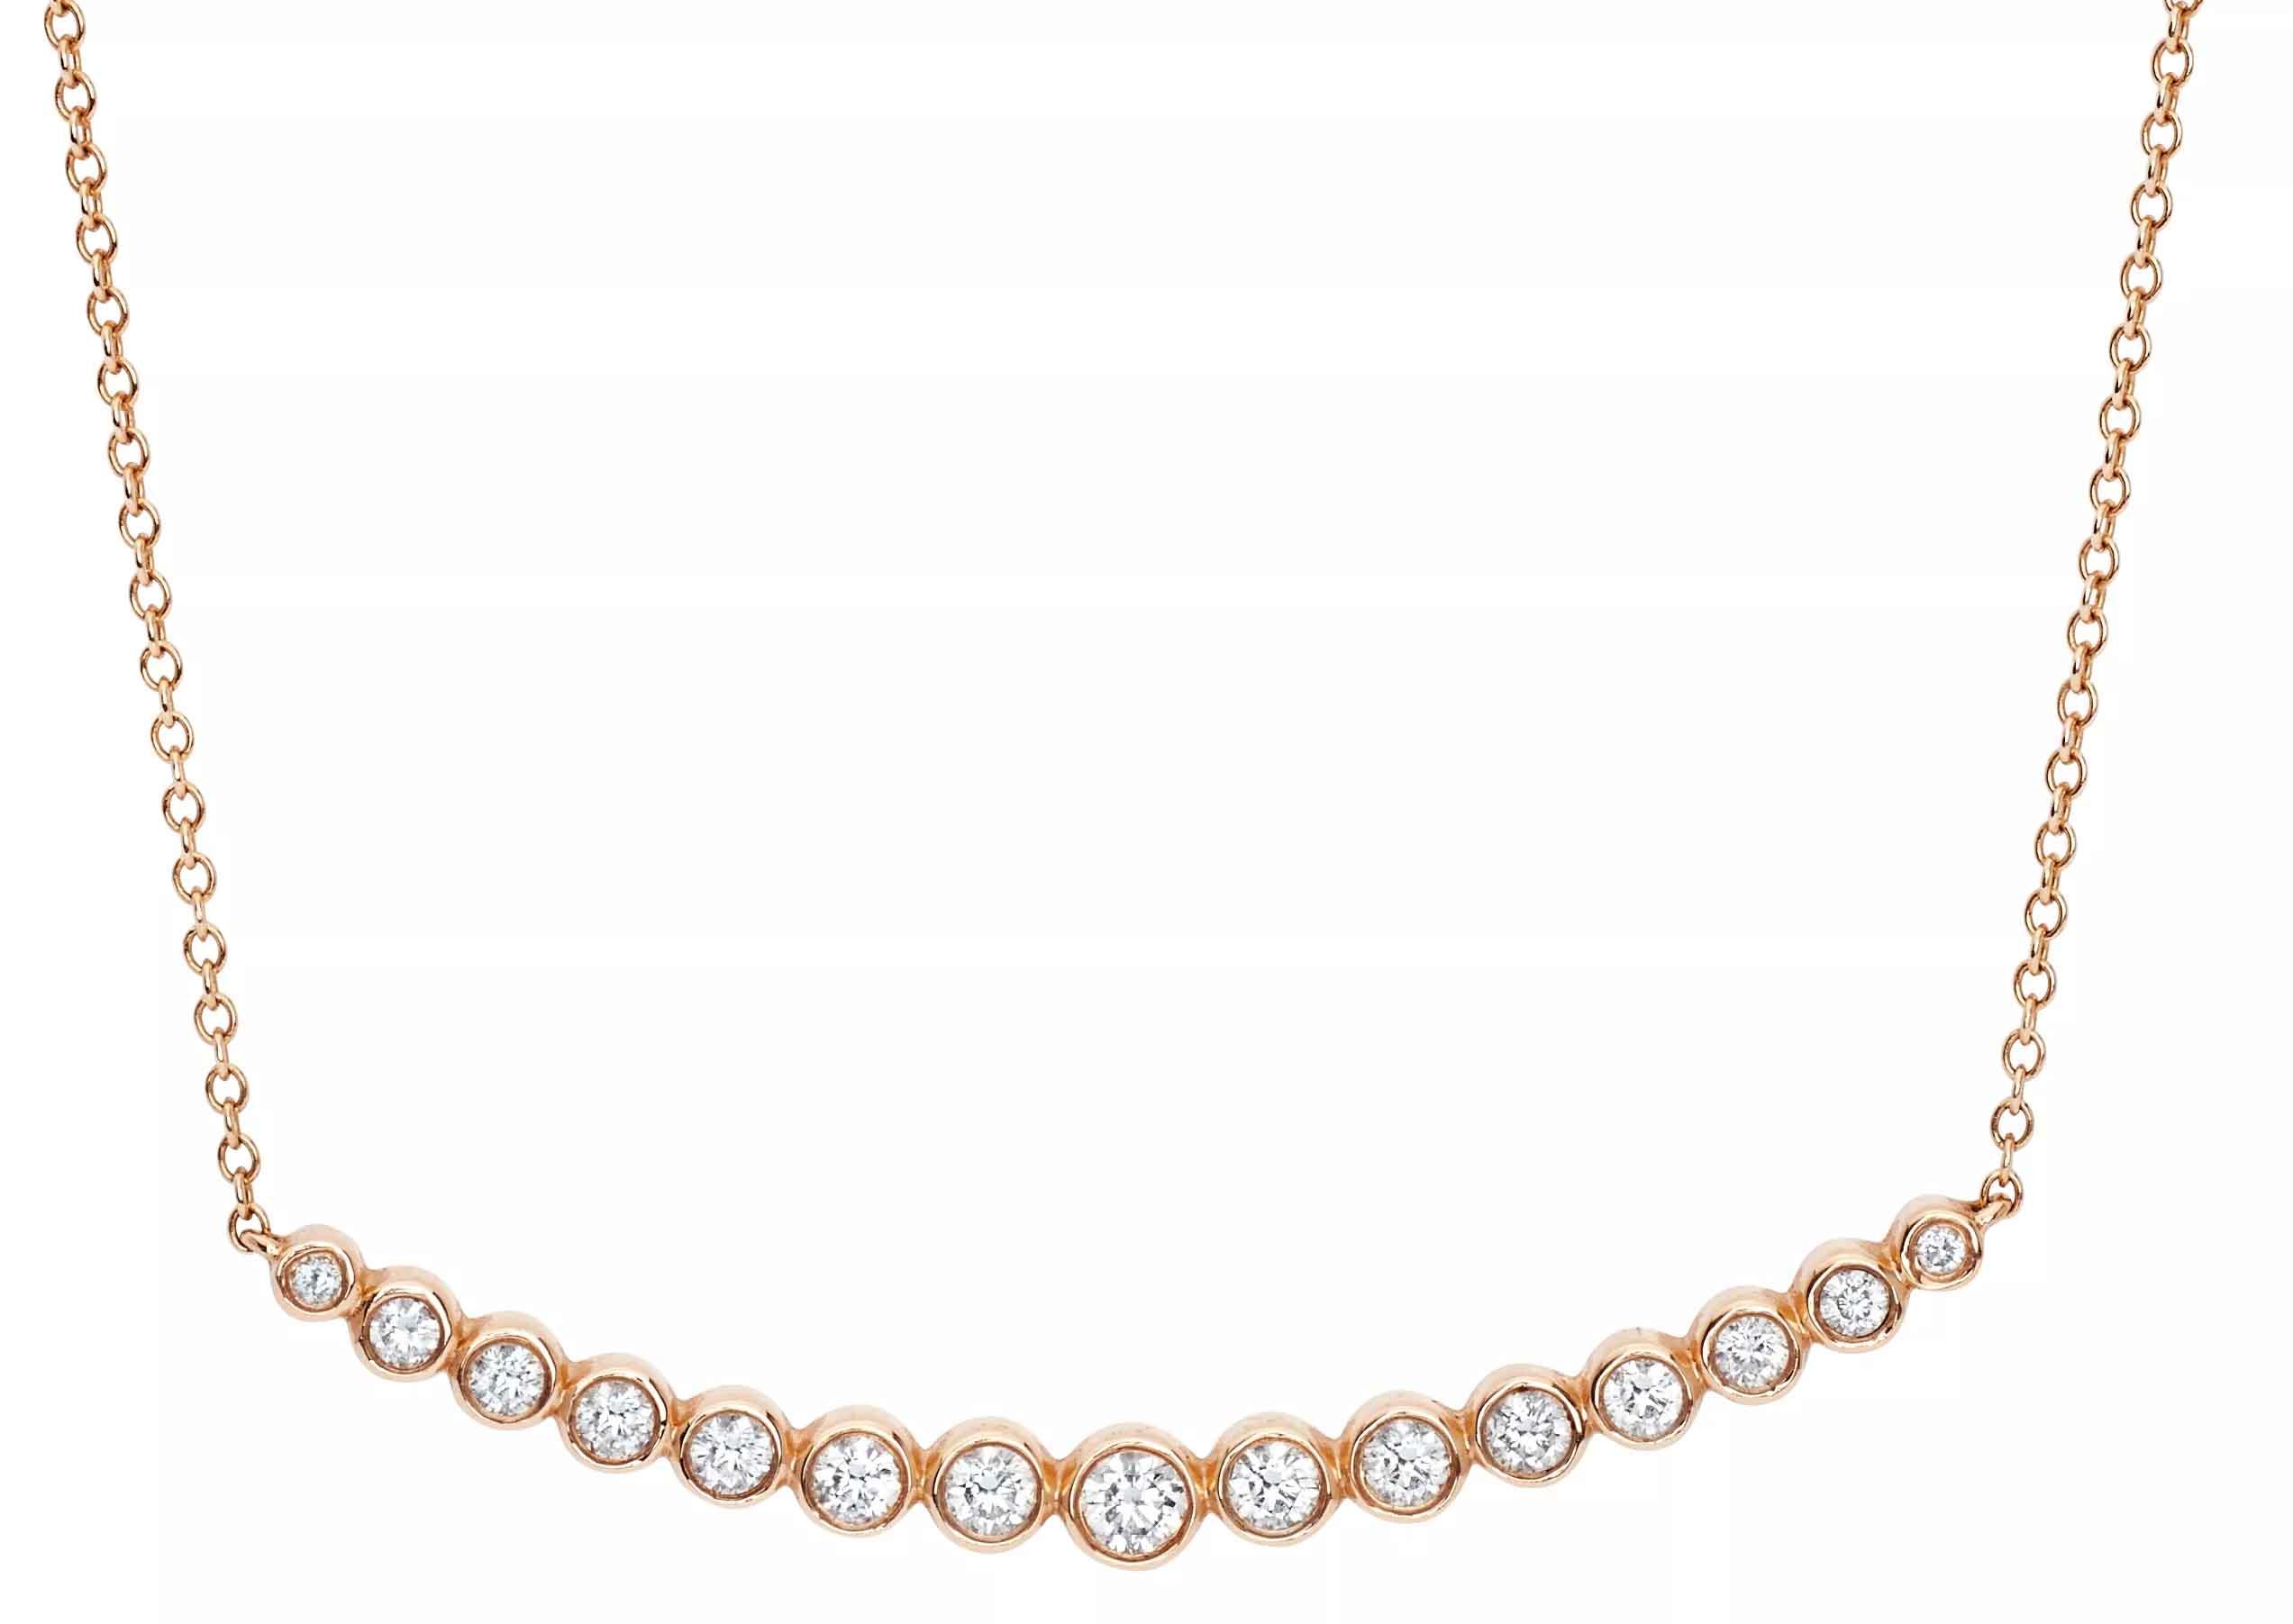 Multi-bezel crescent necklace